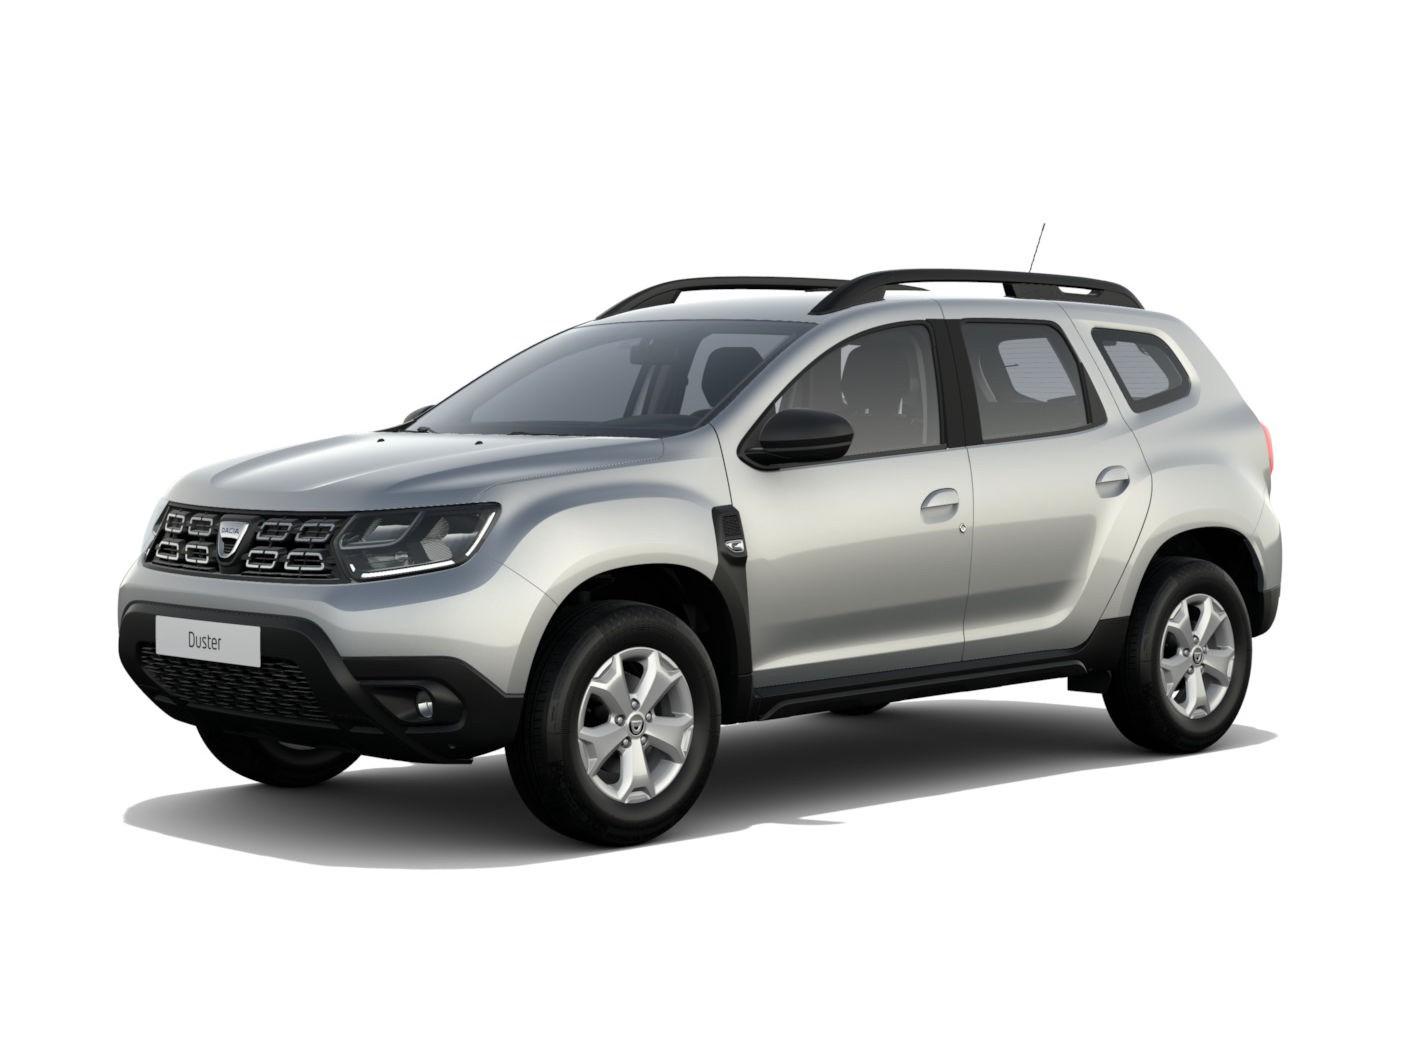 Dacia Duster 1.0 tce bi-fuel comfort